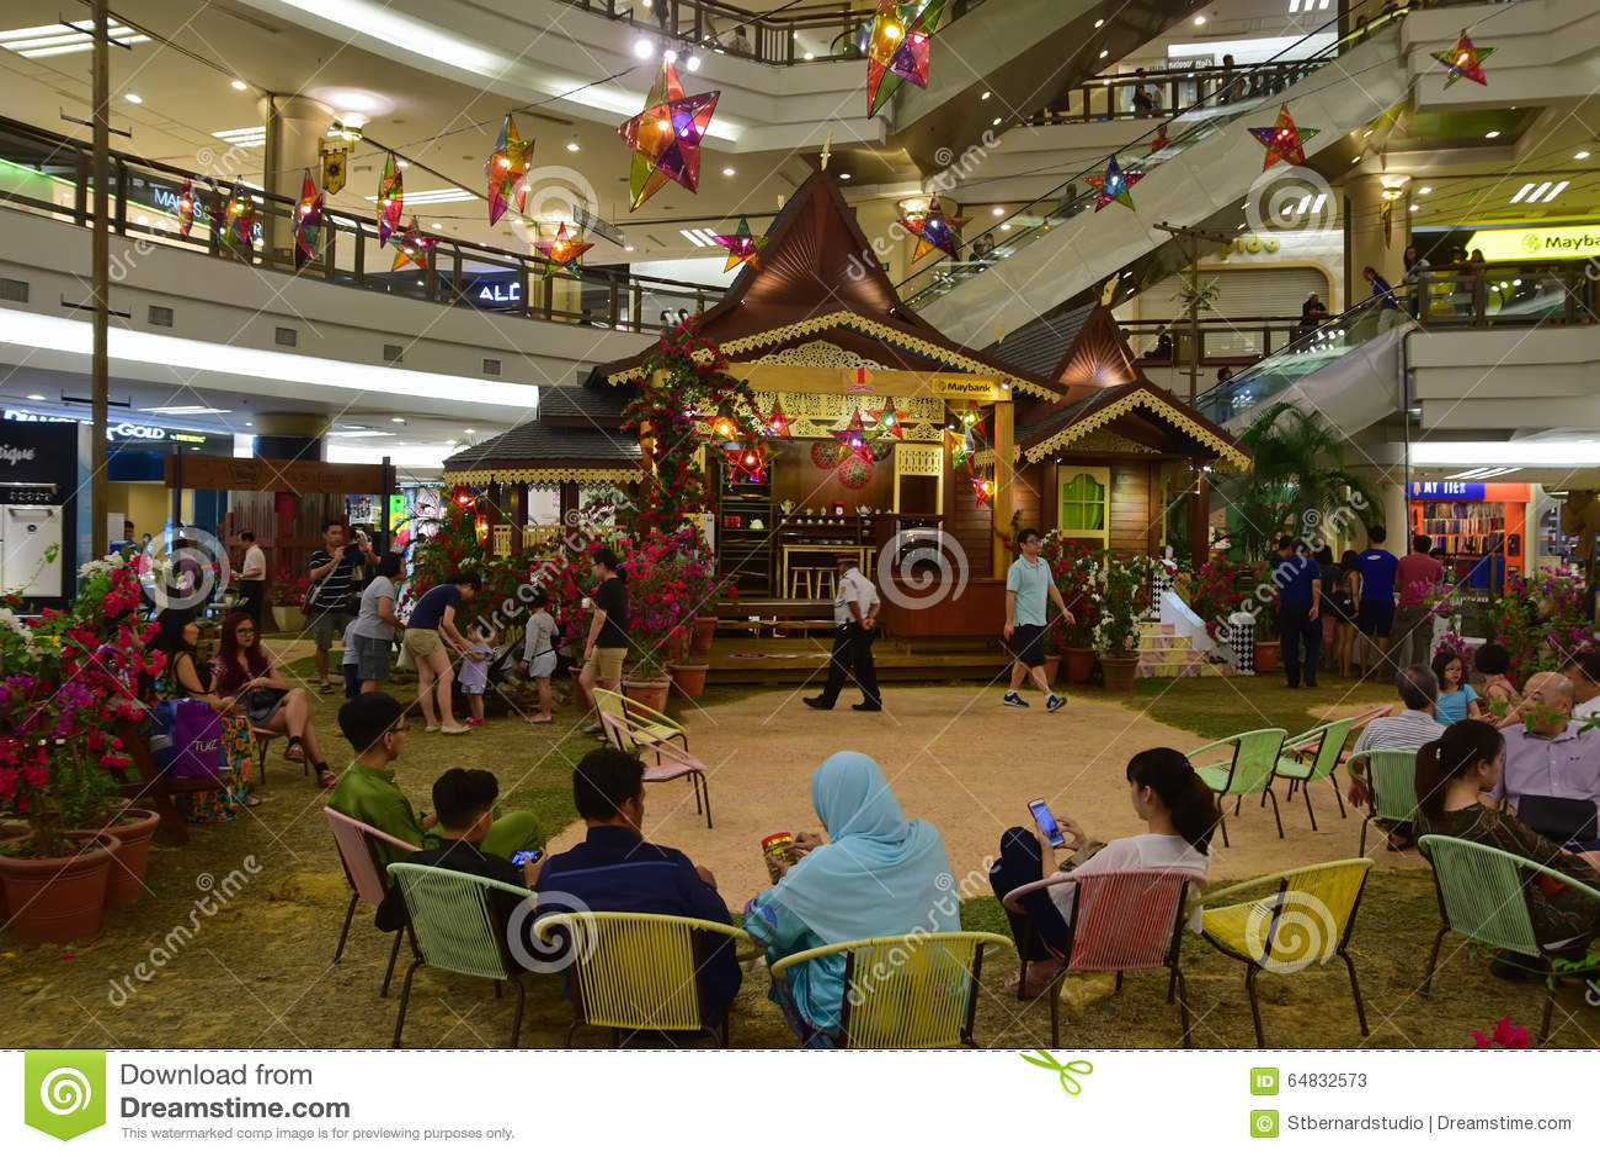 Must see Shop Eid Al-Fitr Decorations - atmoshphere-hari-raya-puasa-eid-al-fitr-shopping-mall-malaysia-festive-period-typical-many-people-64832573  Pic_908580 .jpg